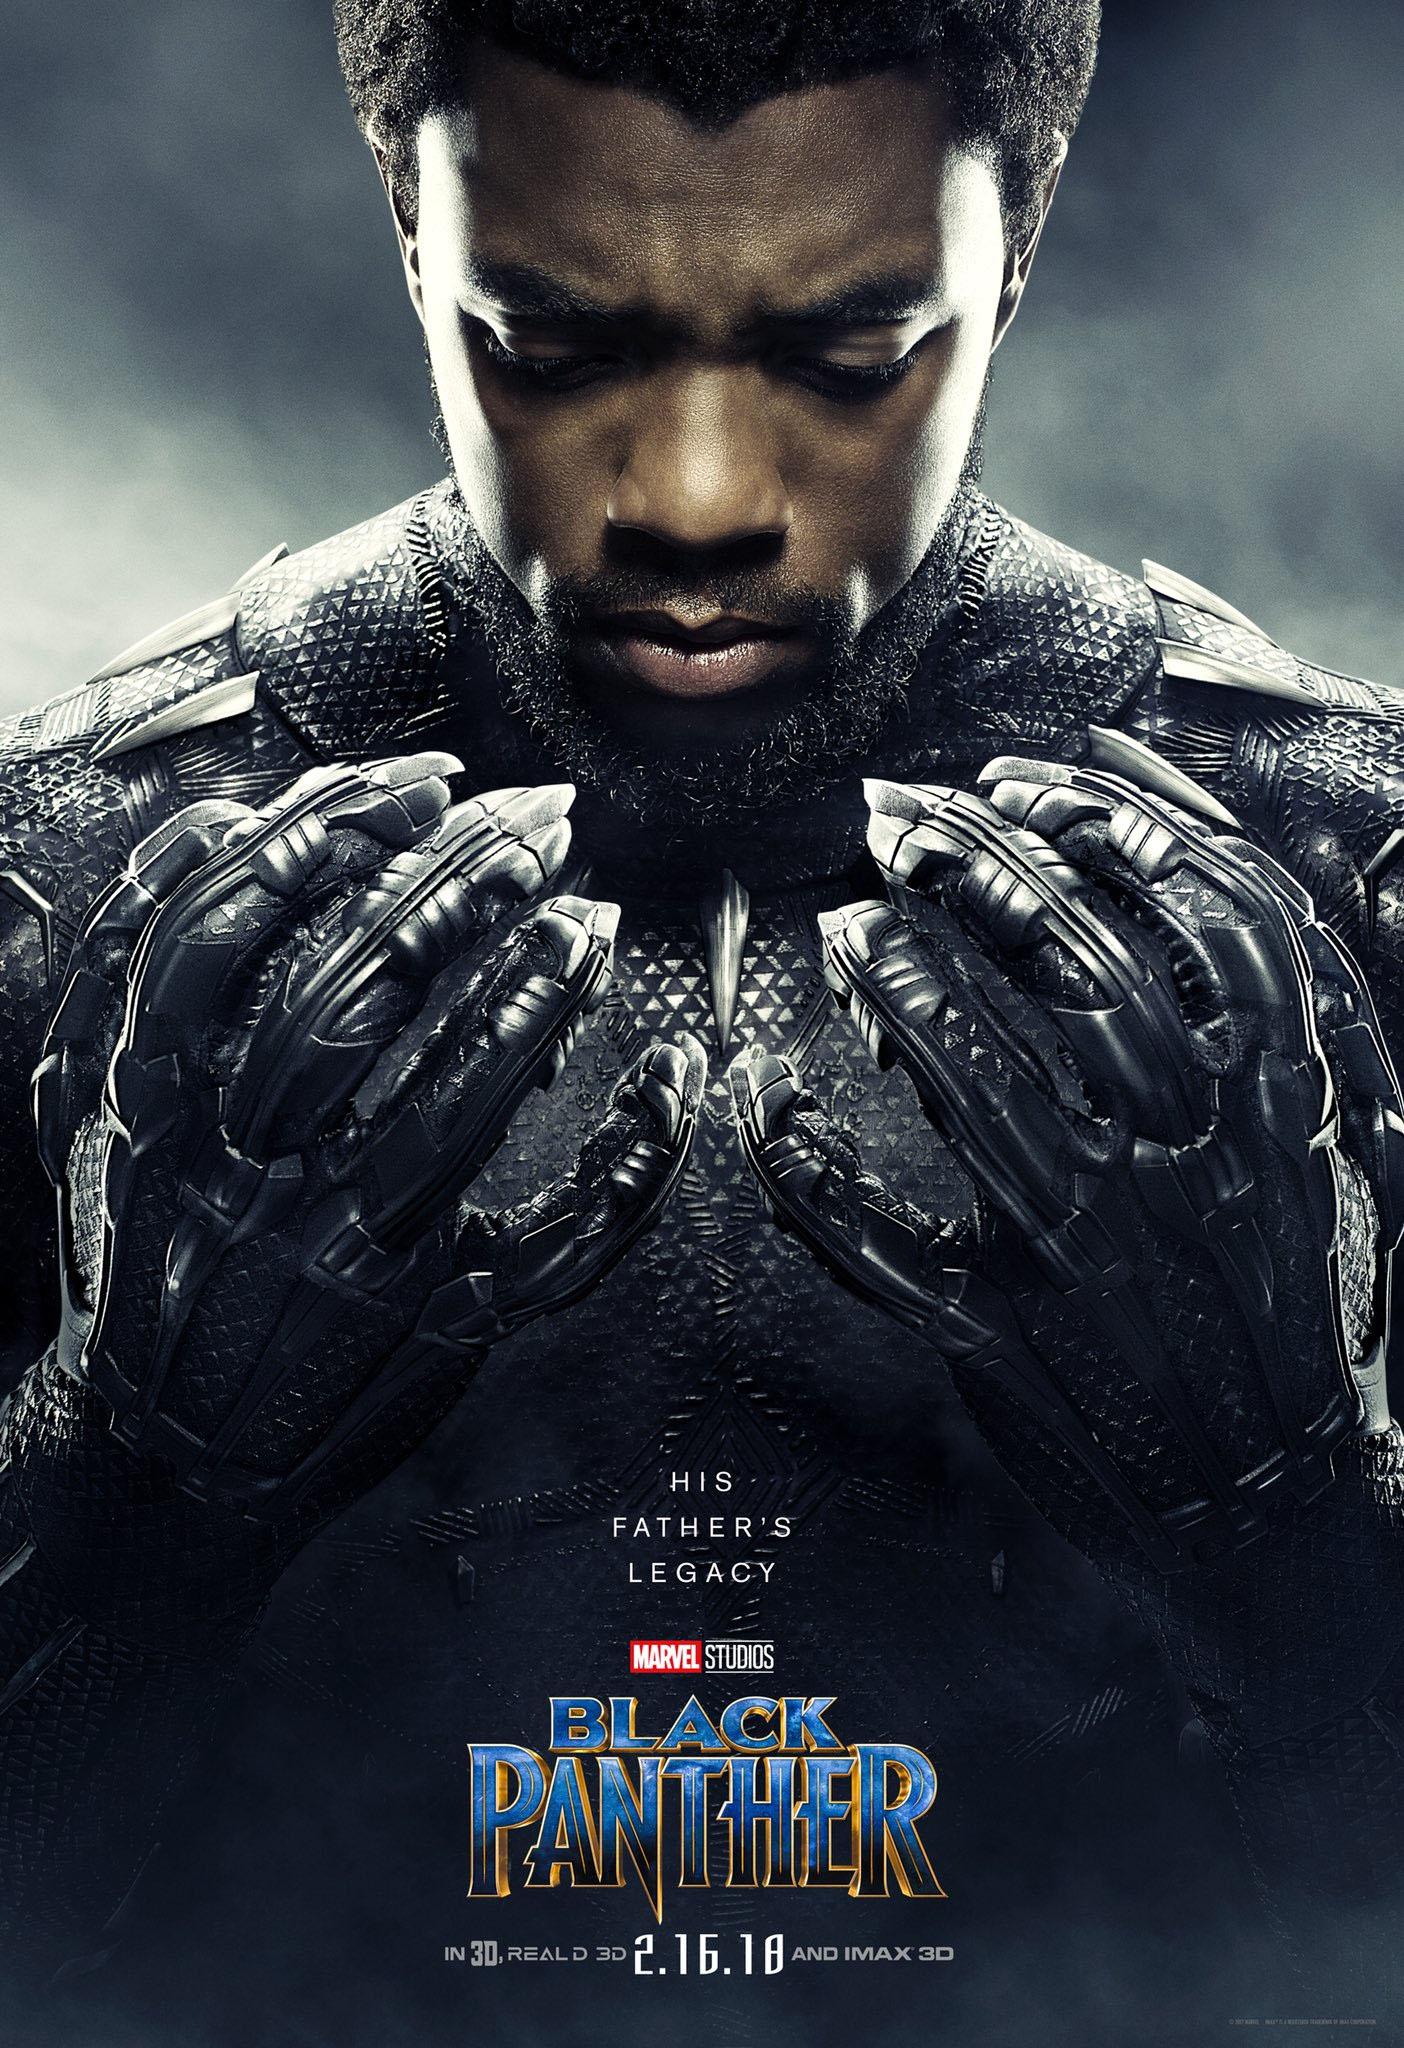 دانلود فیلم Black Panther 2018 + زیرنویس + کیفیت بلوری